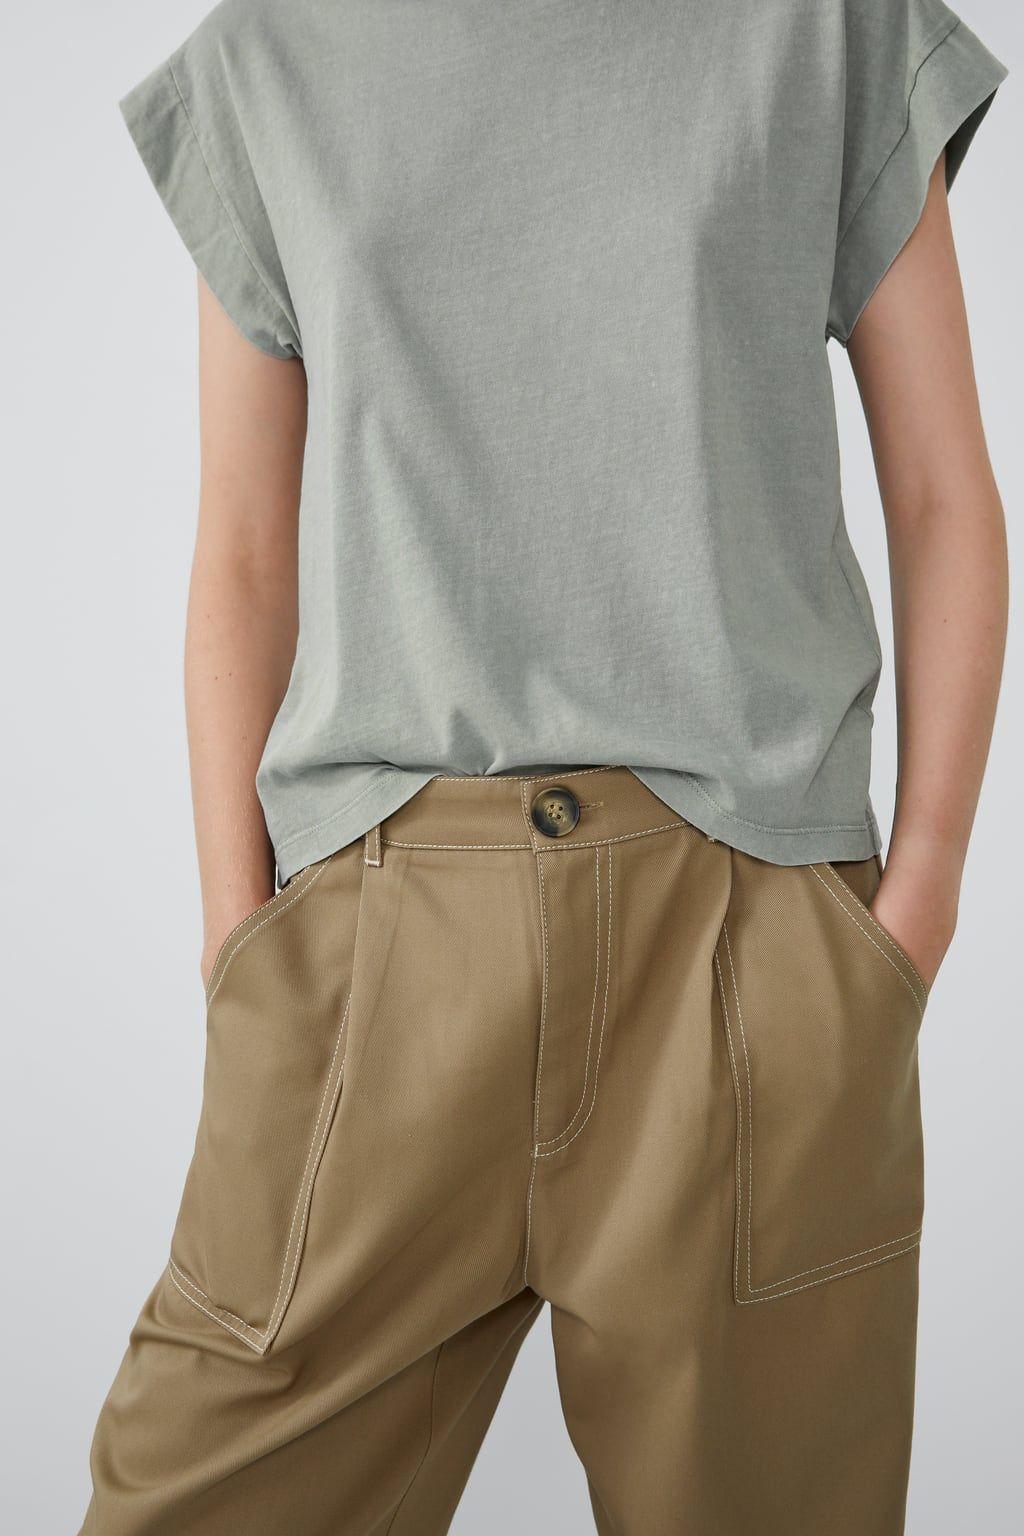 Washed effect t shirt | TOPS in 2019 | Shirts, T shirt